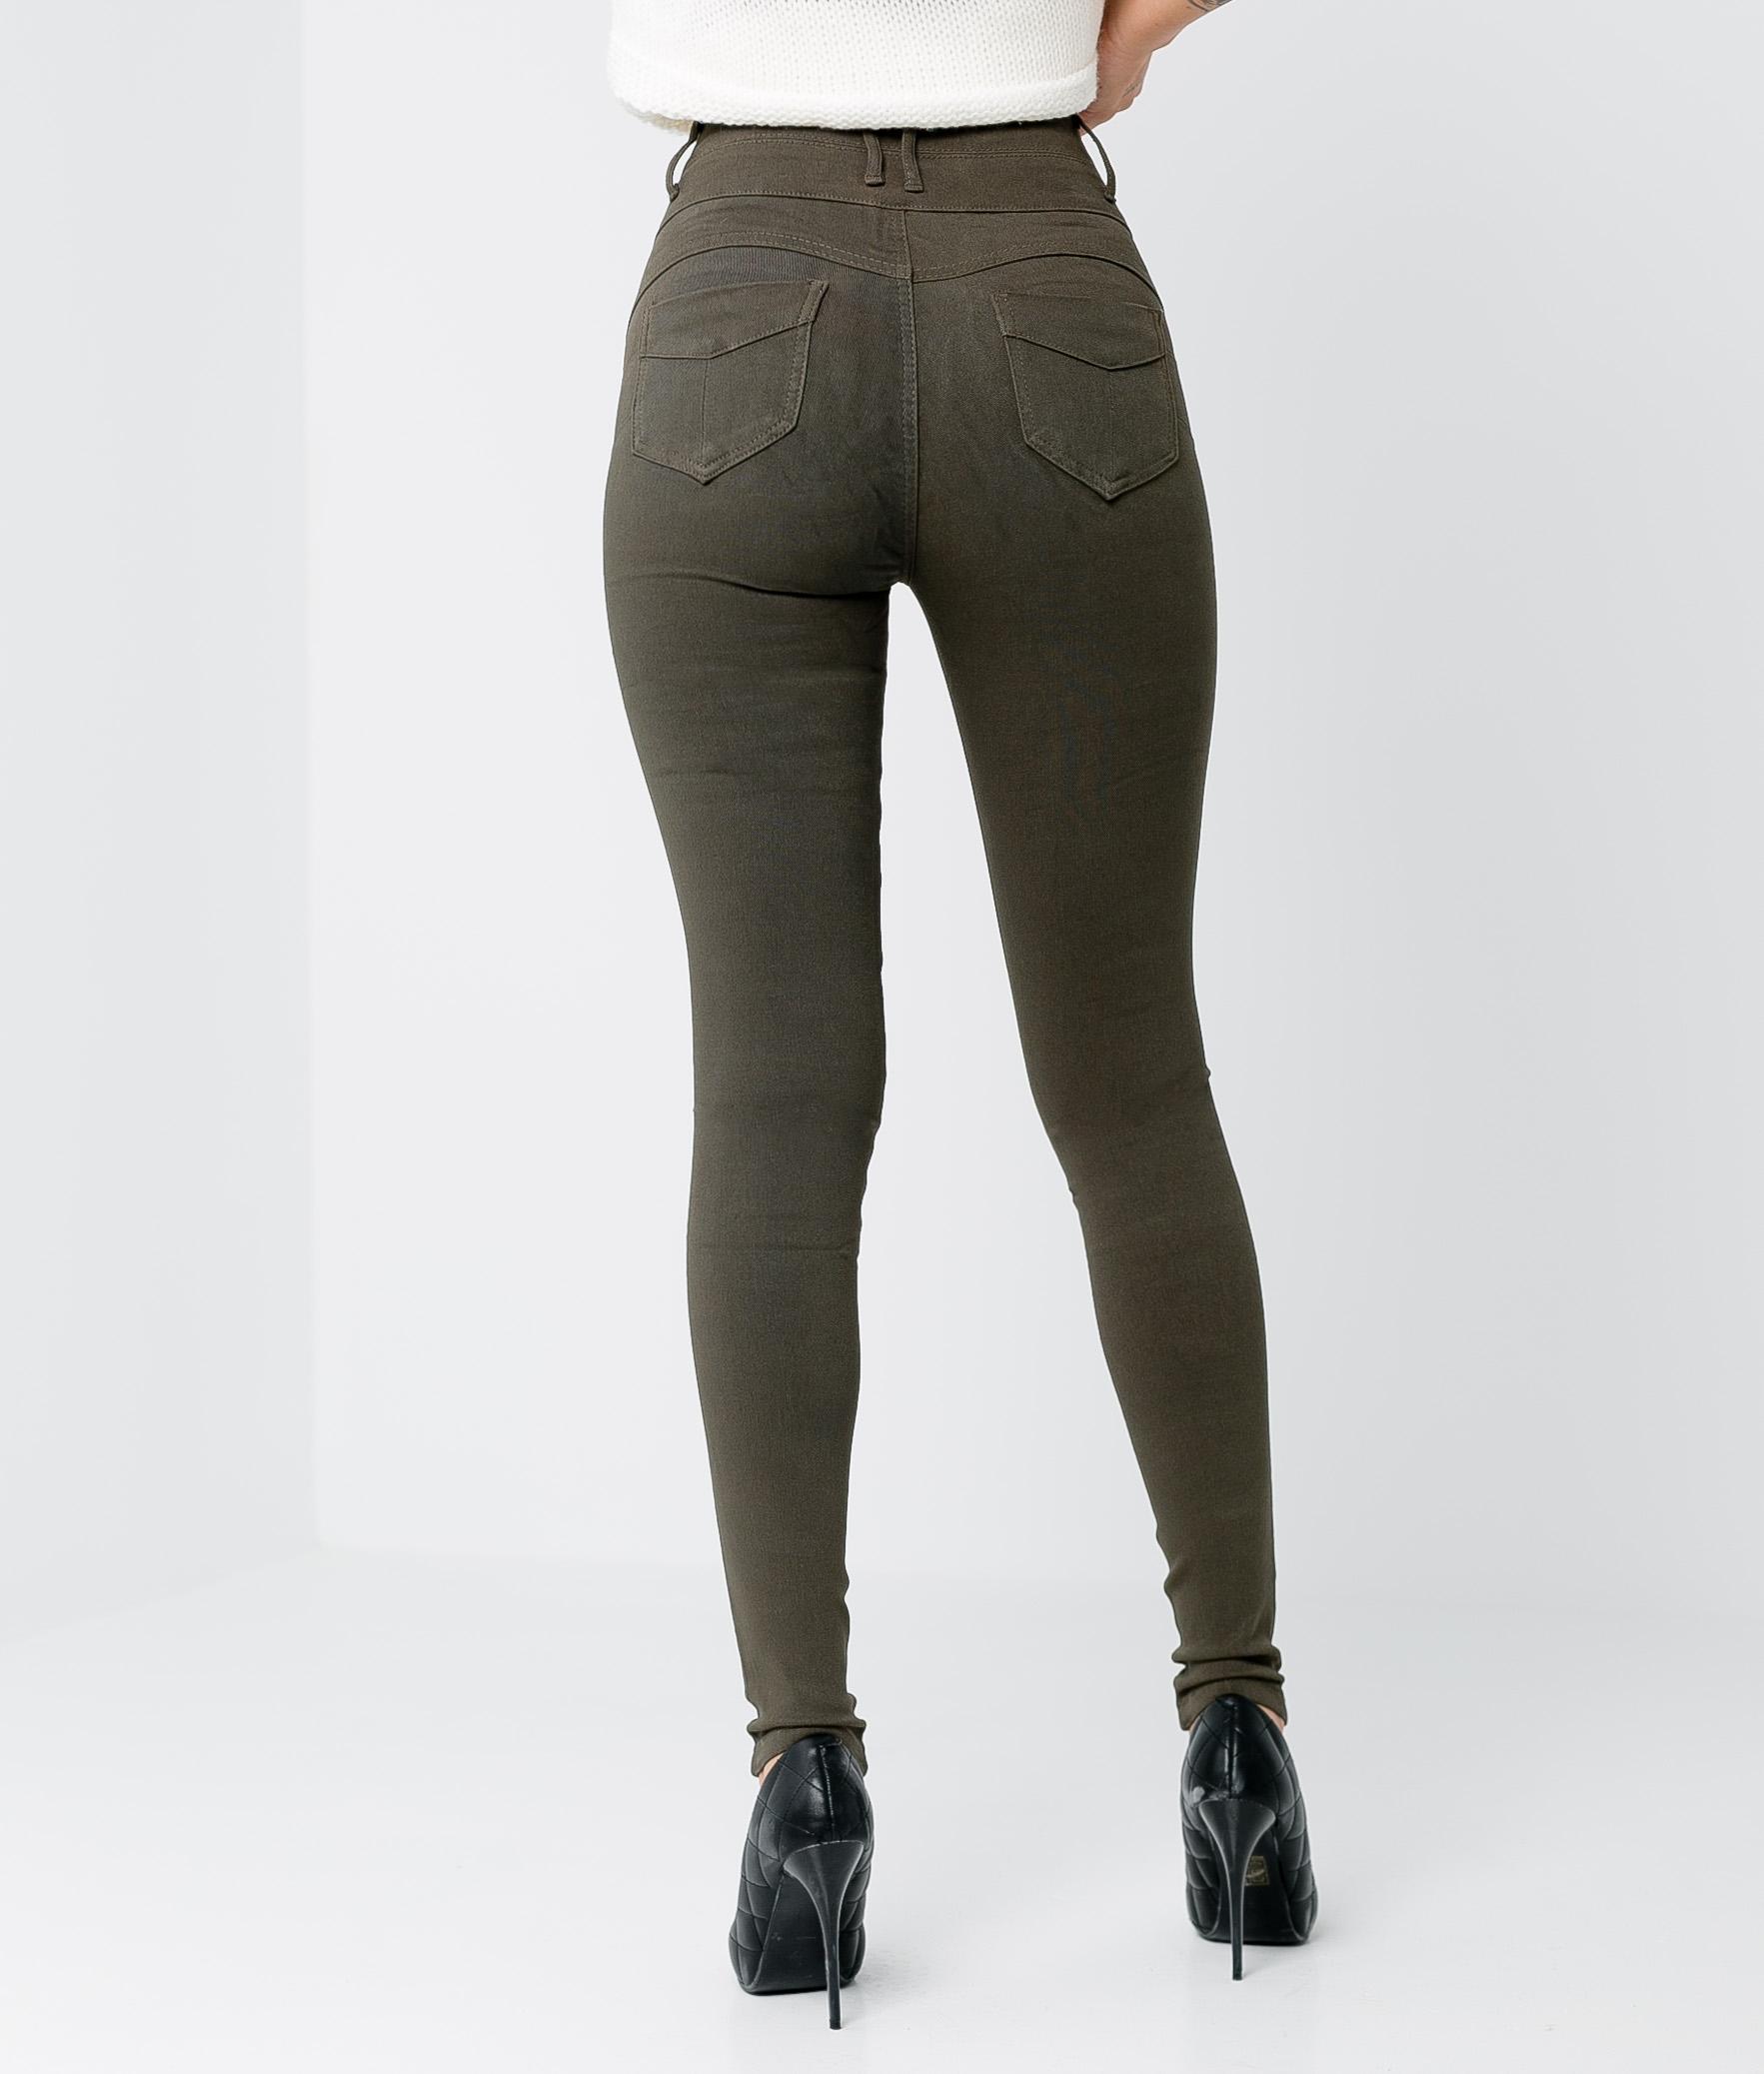 Trousers Subama - Khaki